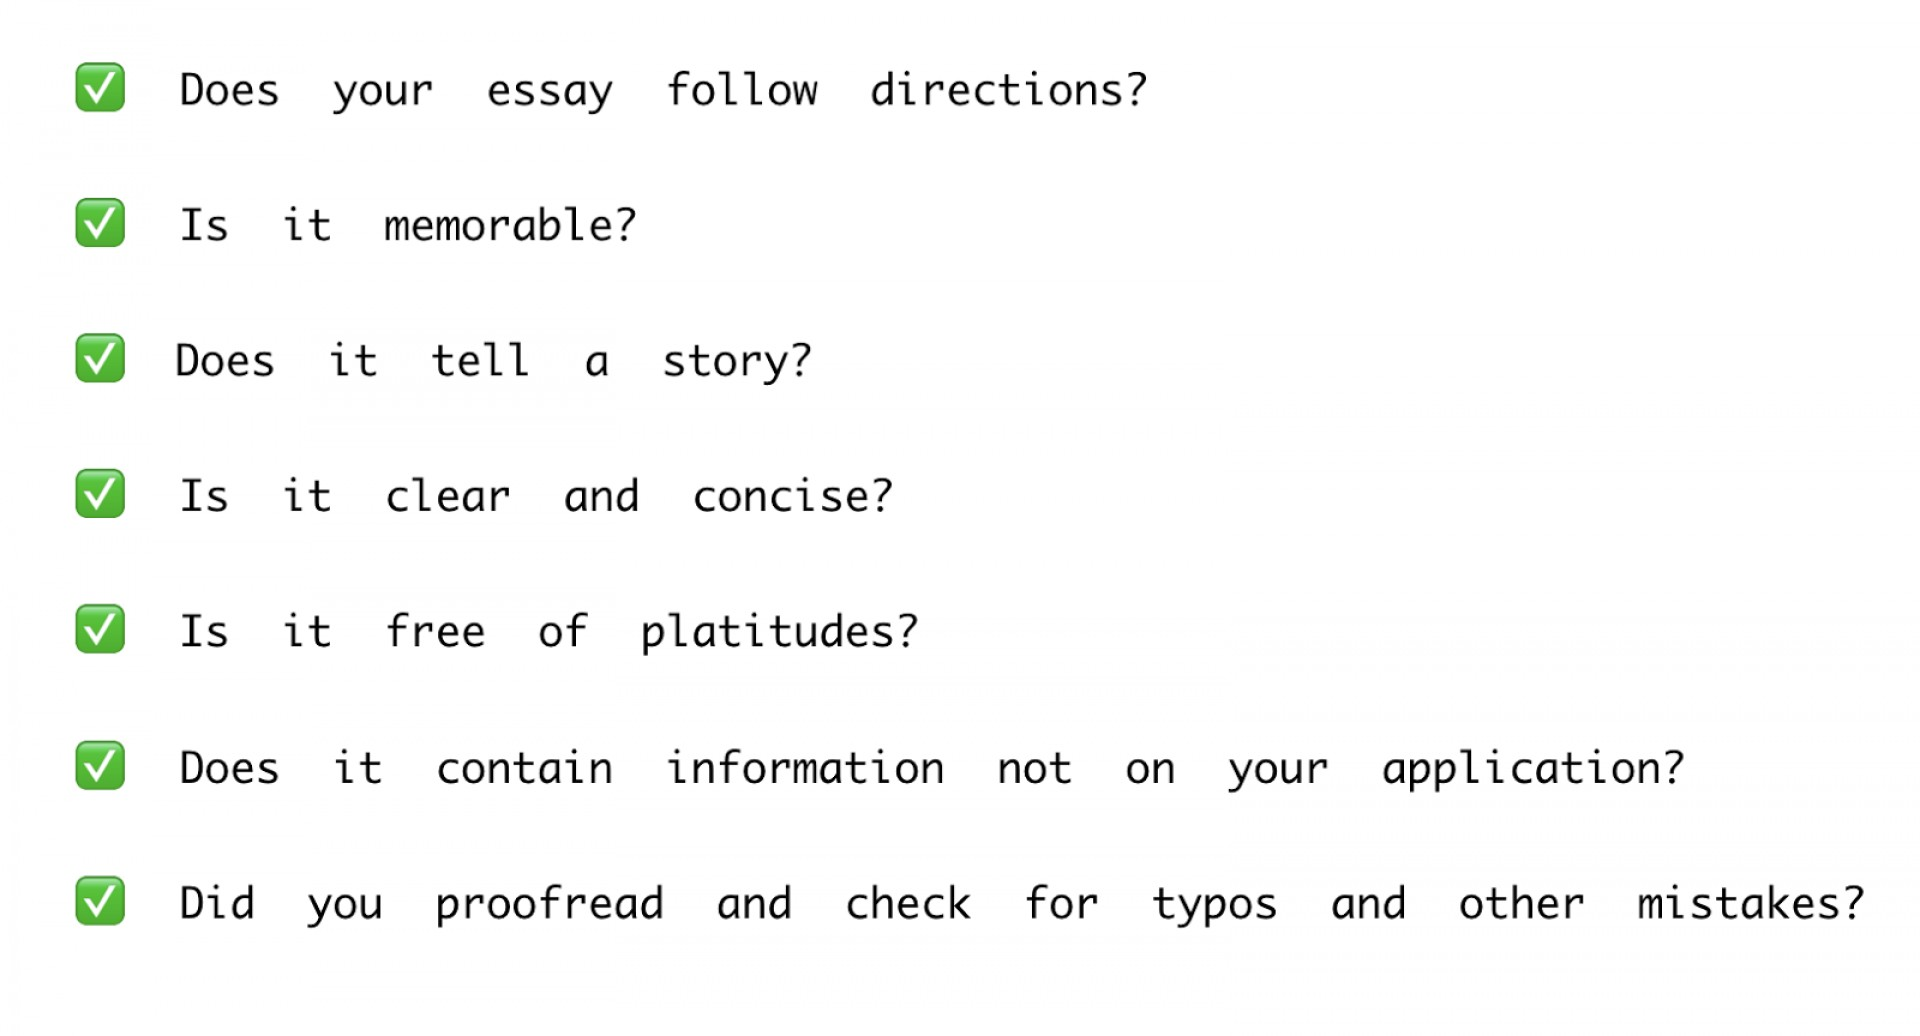 005 84342c807cd6 Pasted20image200 Essay Example Scholarship Singular Tips Gilman Psc Goldwater 1920